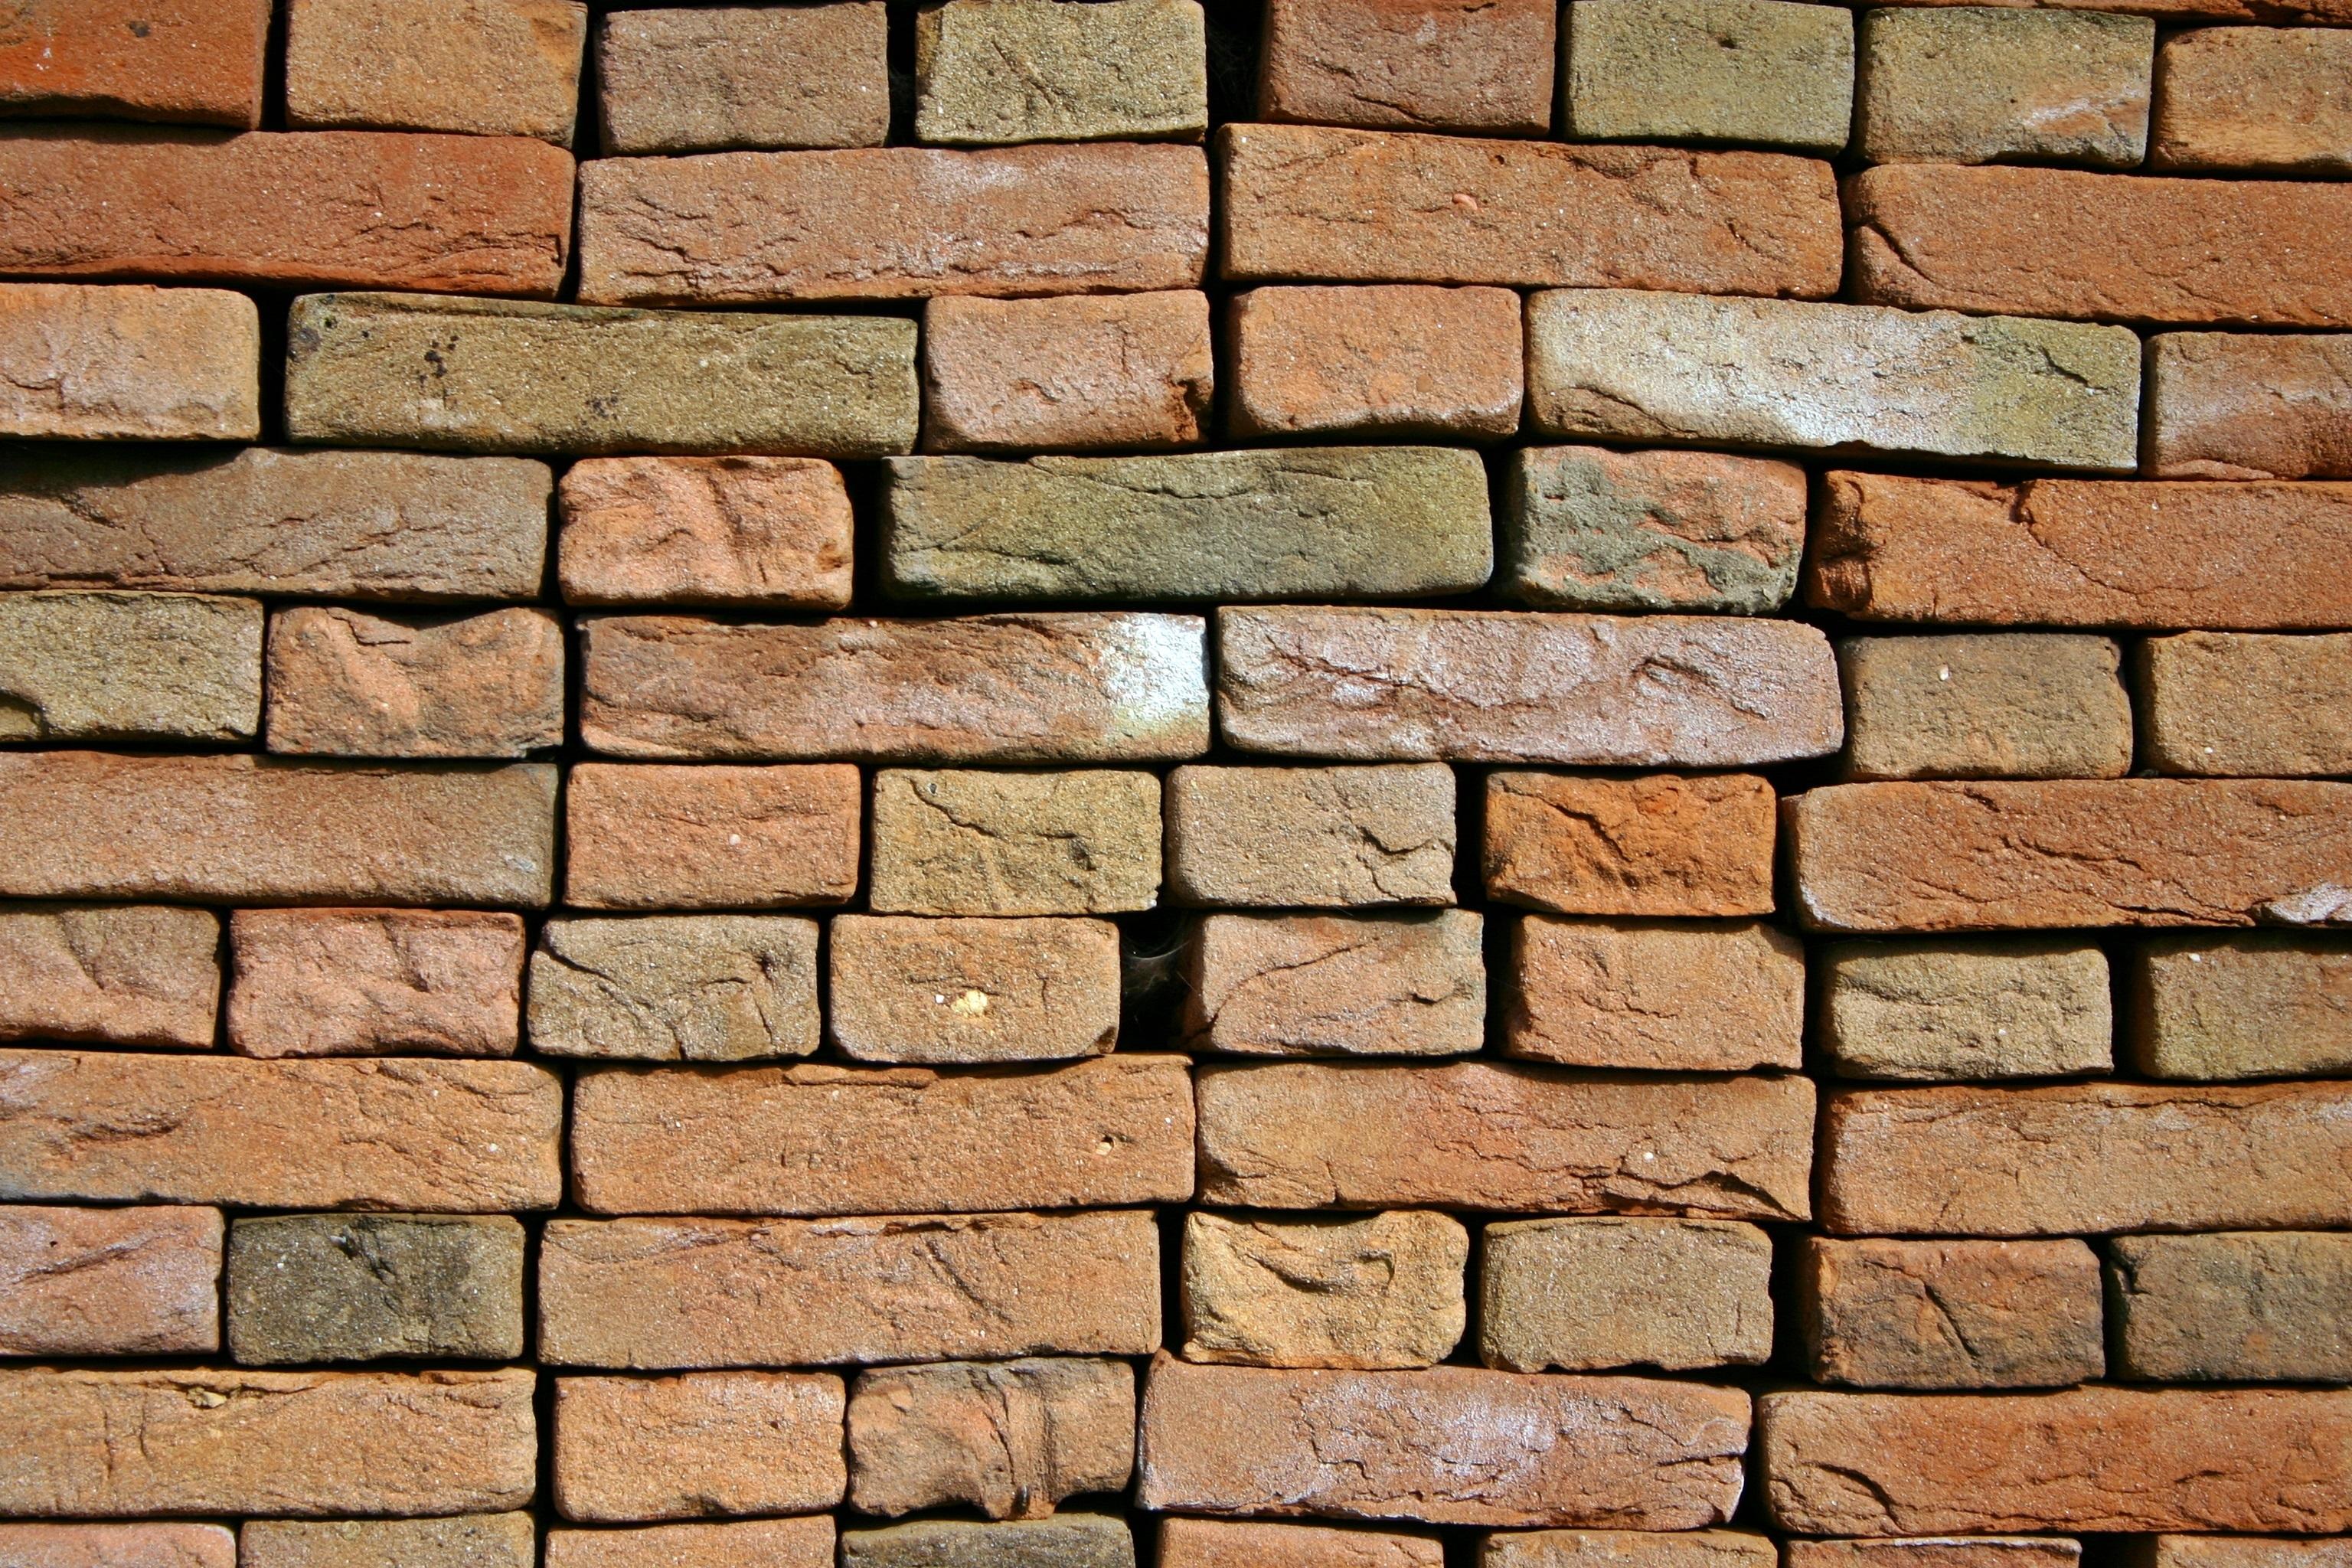 Structure Wood Texture Floor Wall Stone Orange Brick Material Background Bricks Brickwork